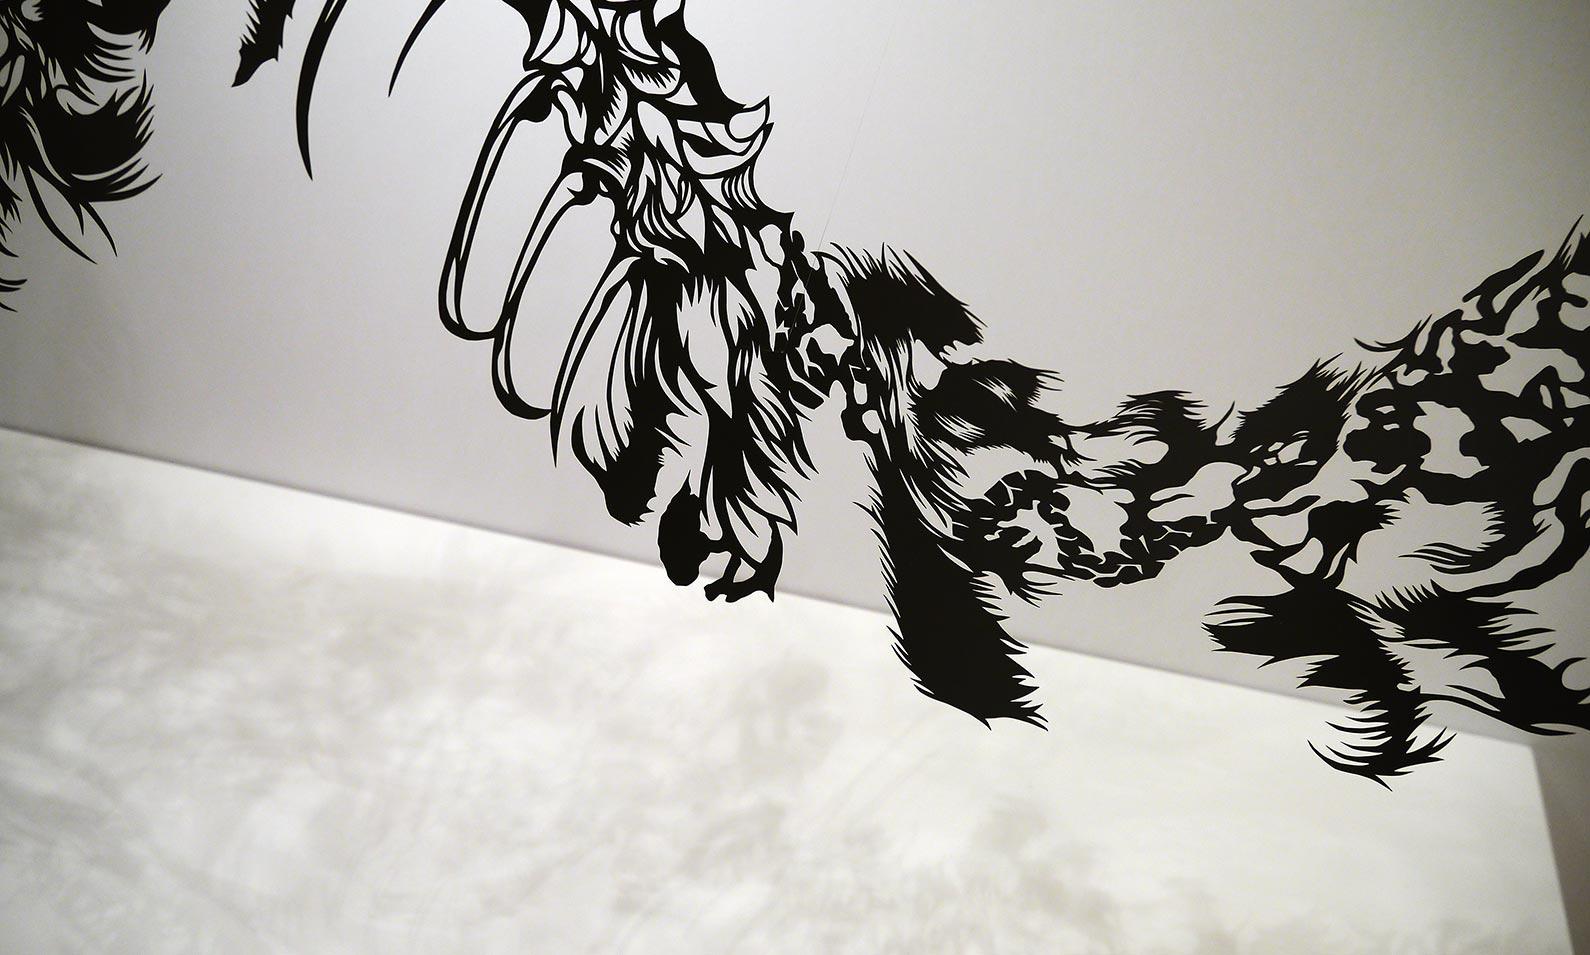 Saatchi Papercut - Nahoko Kojima - Cloud Leopard Sculpture